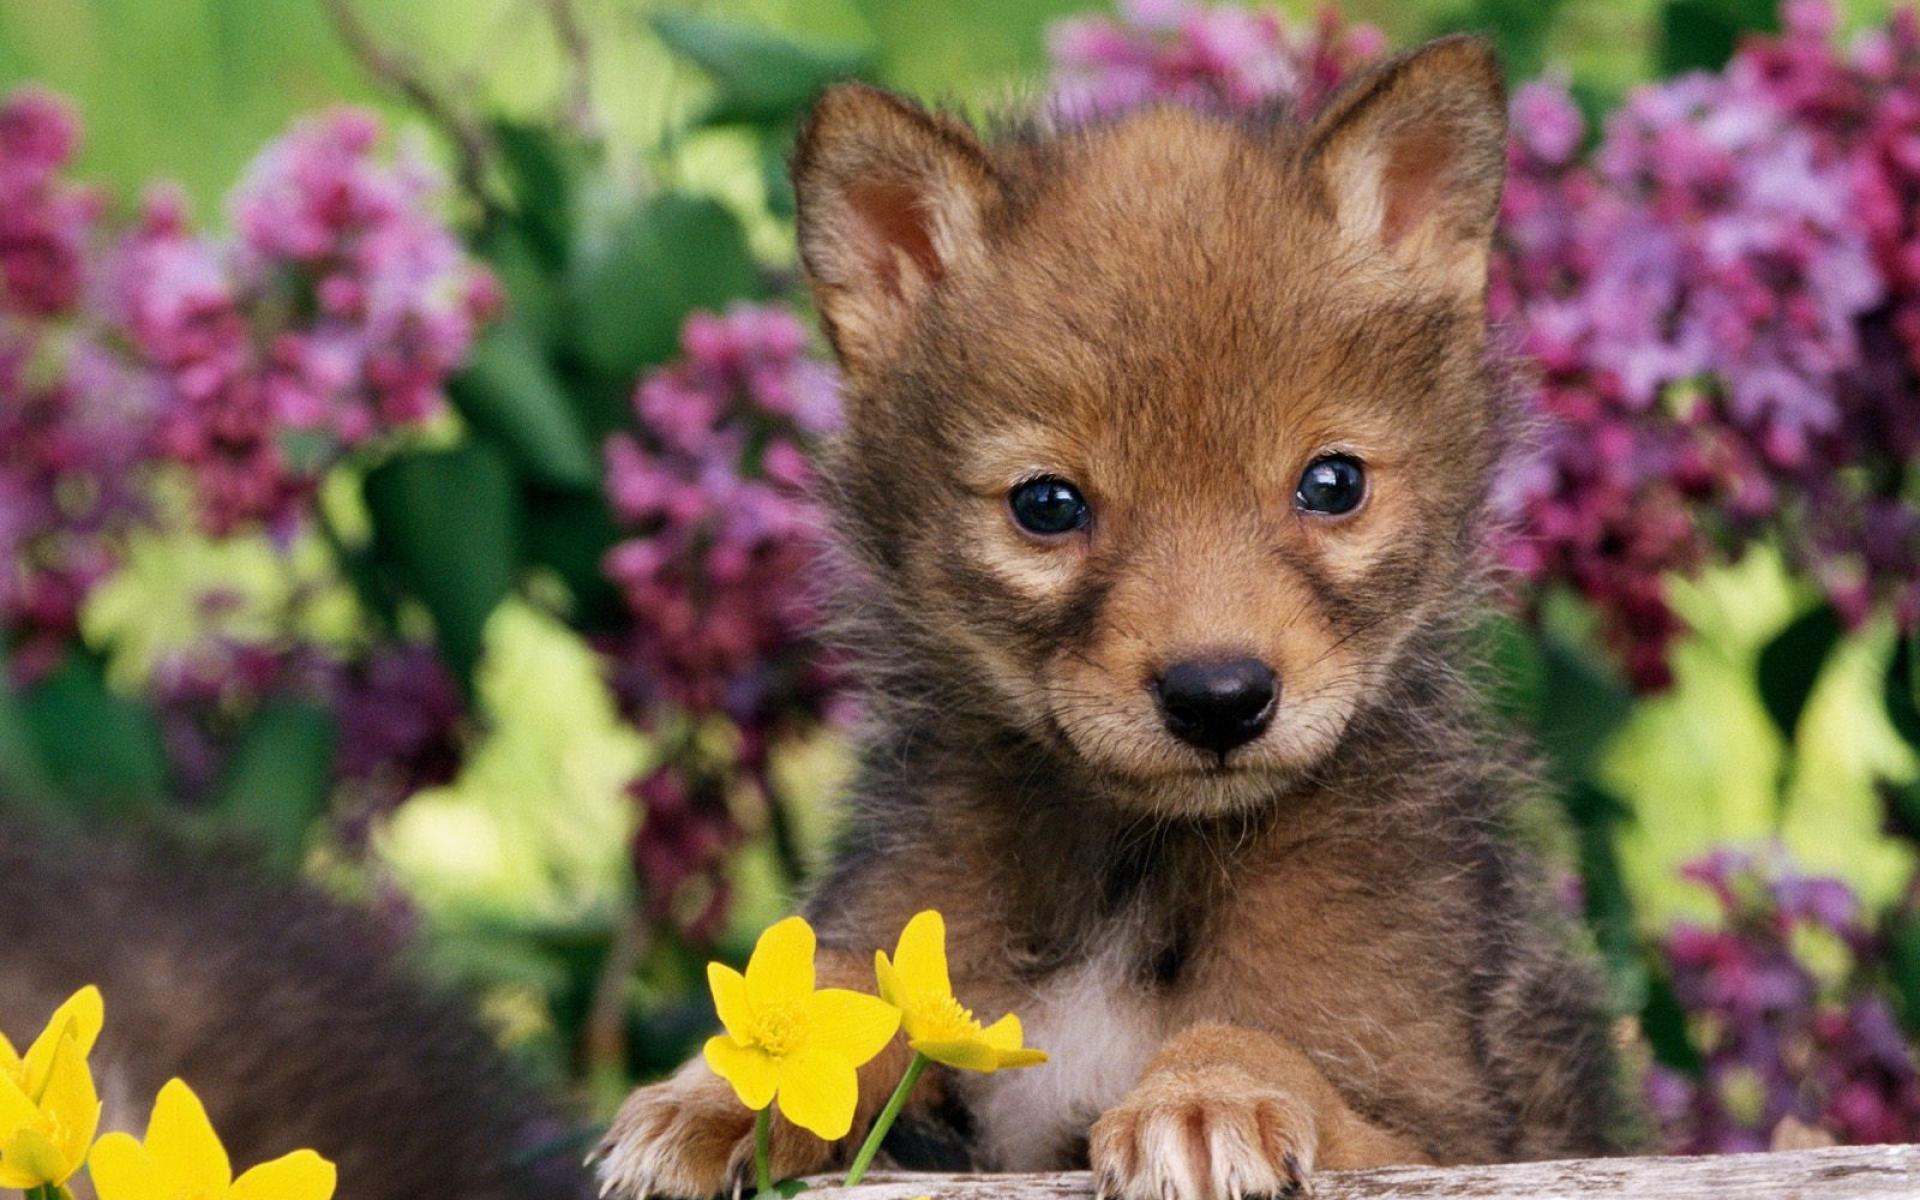 Картинки Щенок, трава, волк, детеныш, собака фото и обои на рабочий стол